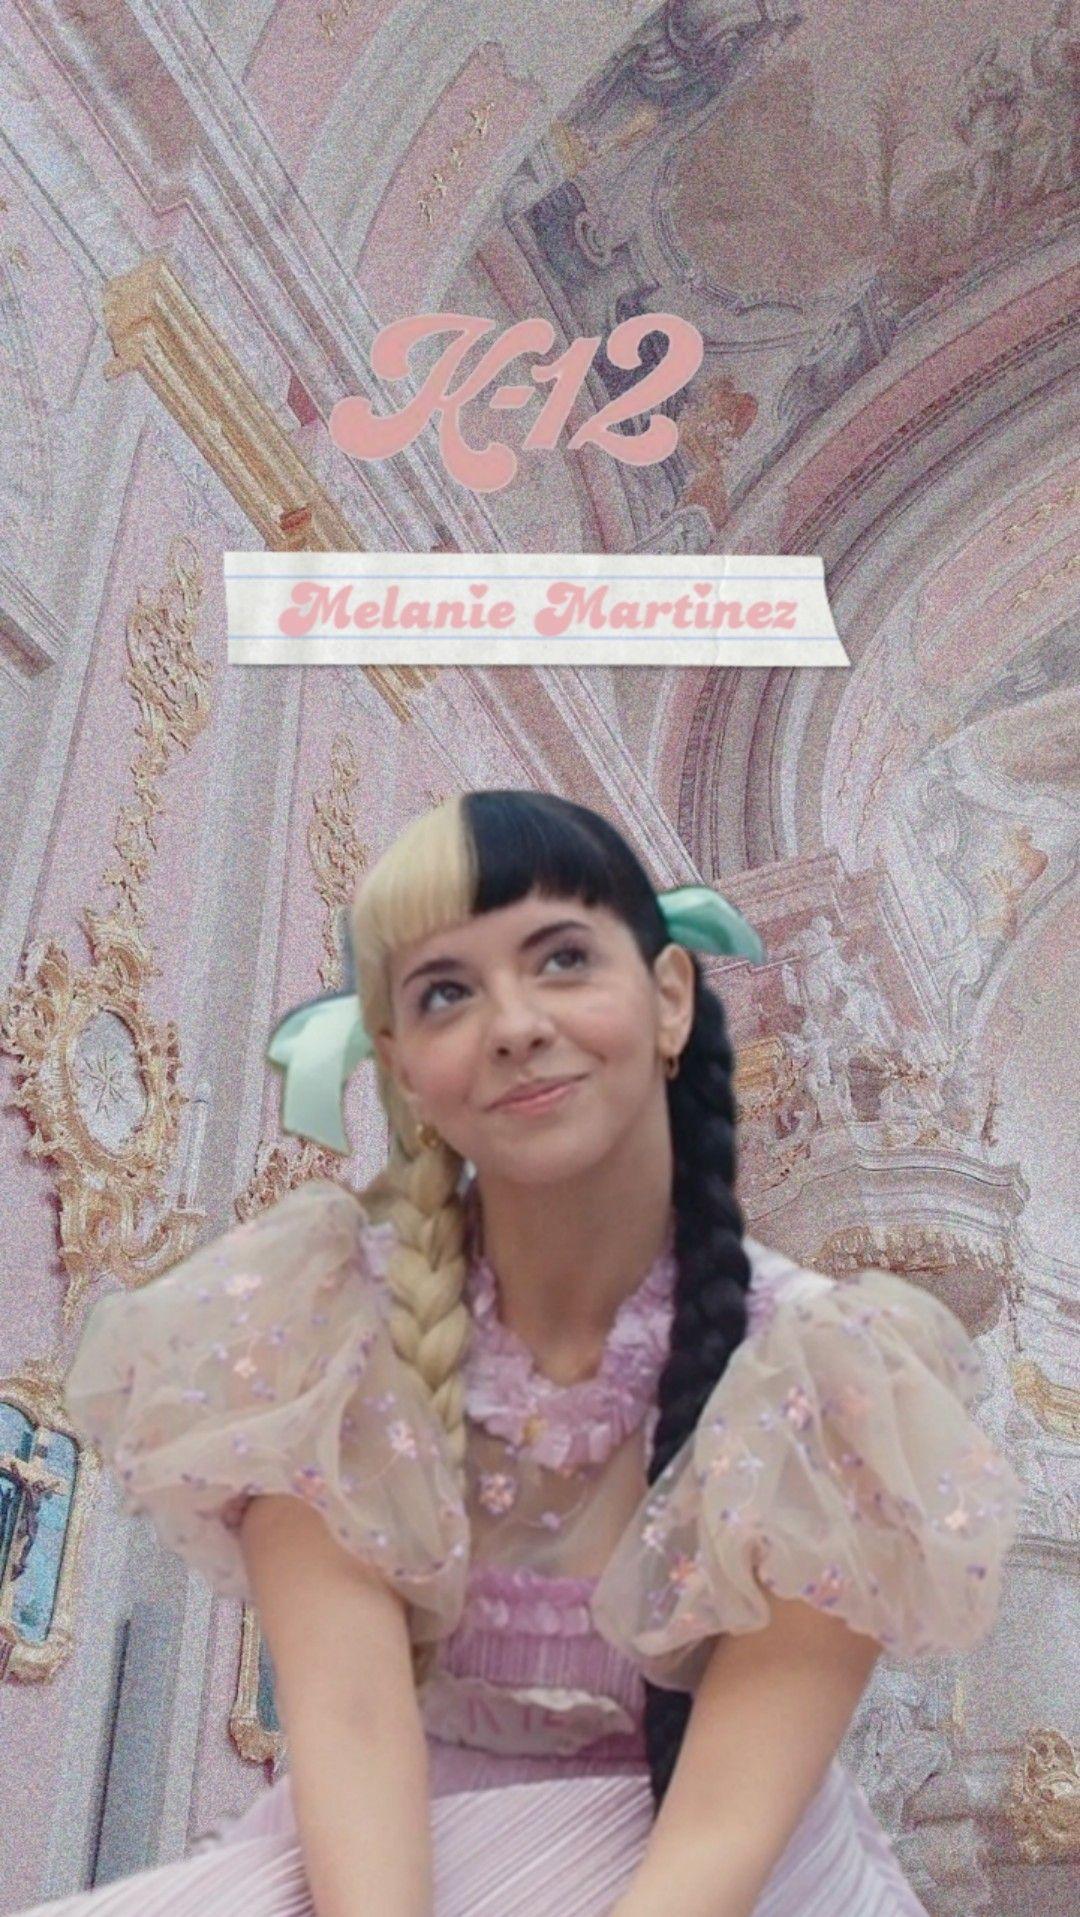 Wallpaper Melanie Martinez K 12 Melanie Martinez Melanie Crybaby Melanie Martinez